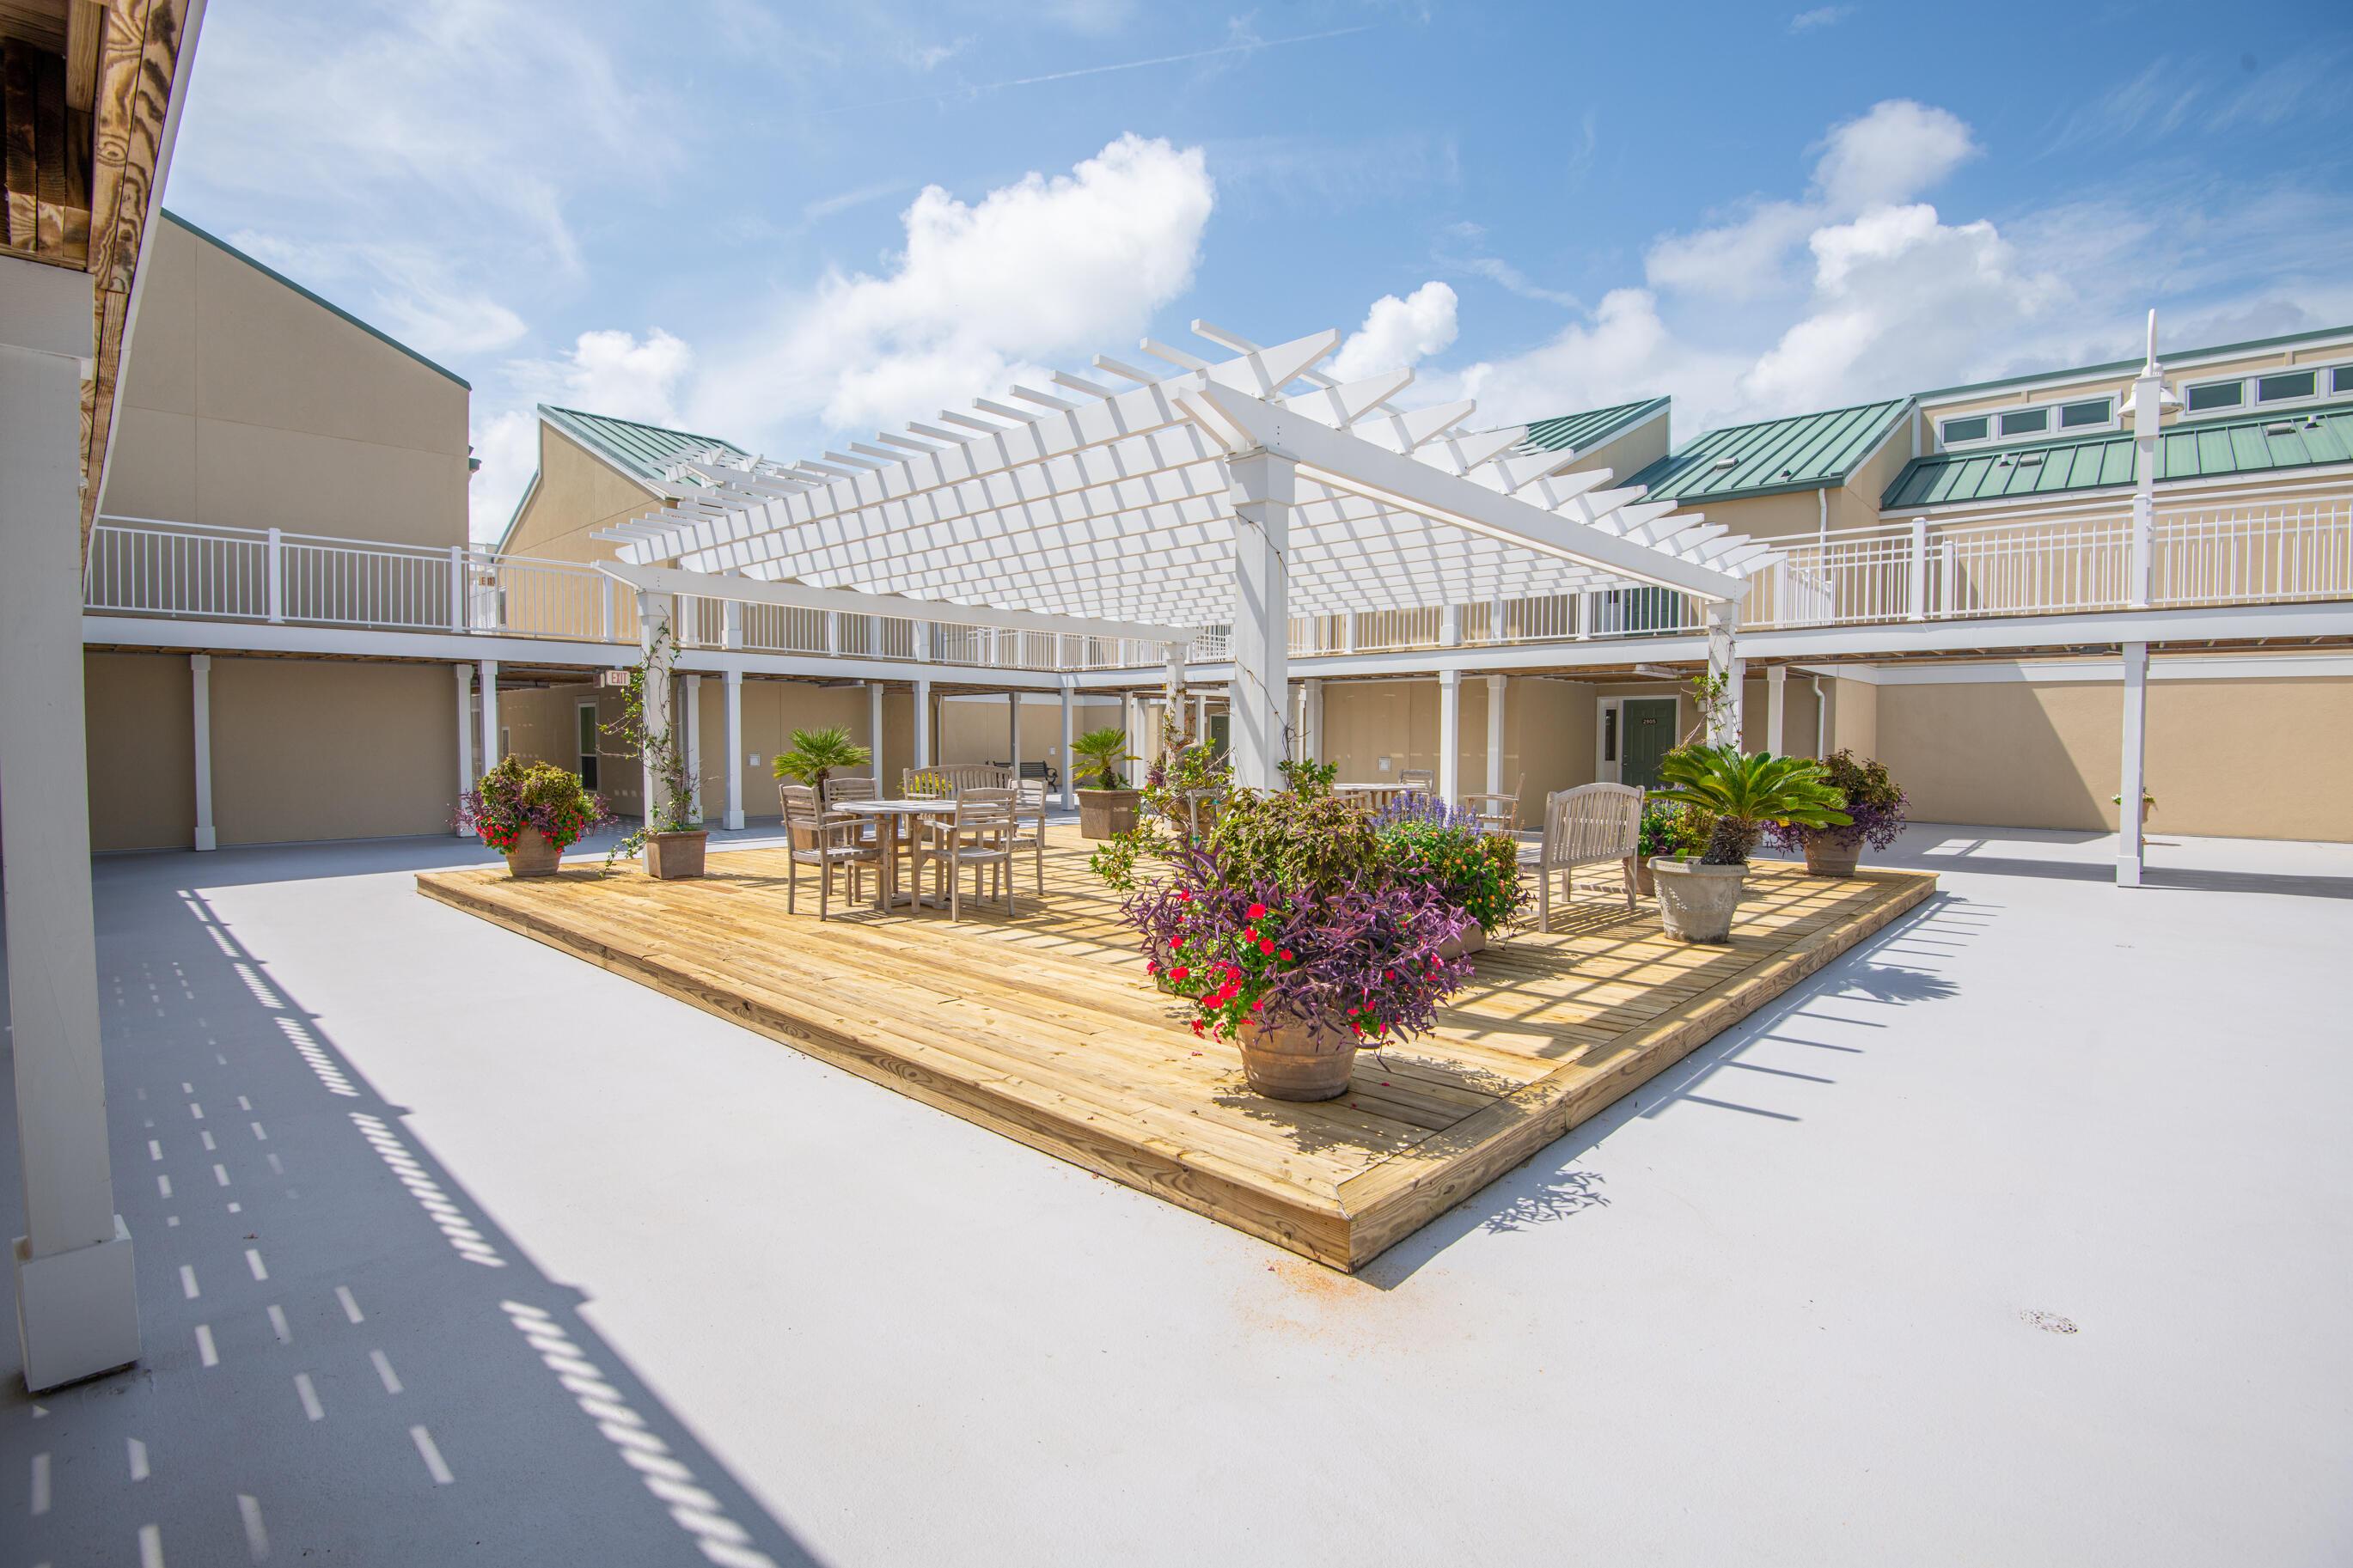 Atrium Villas Homes For Sale - 2935 Atrium Villa, Seabrook Island, SC - 1